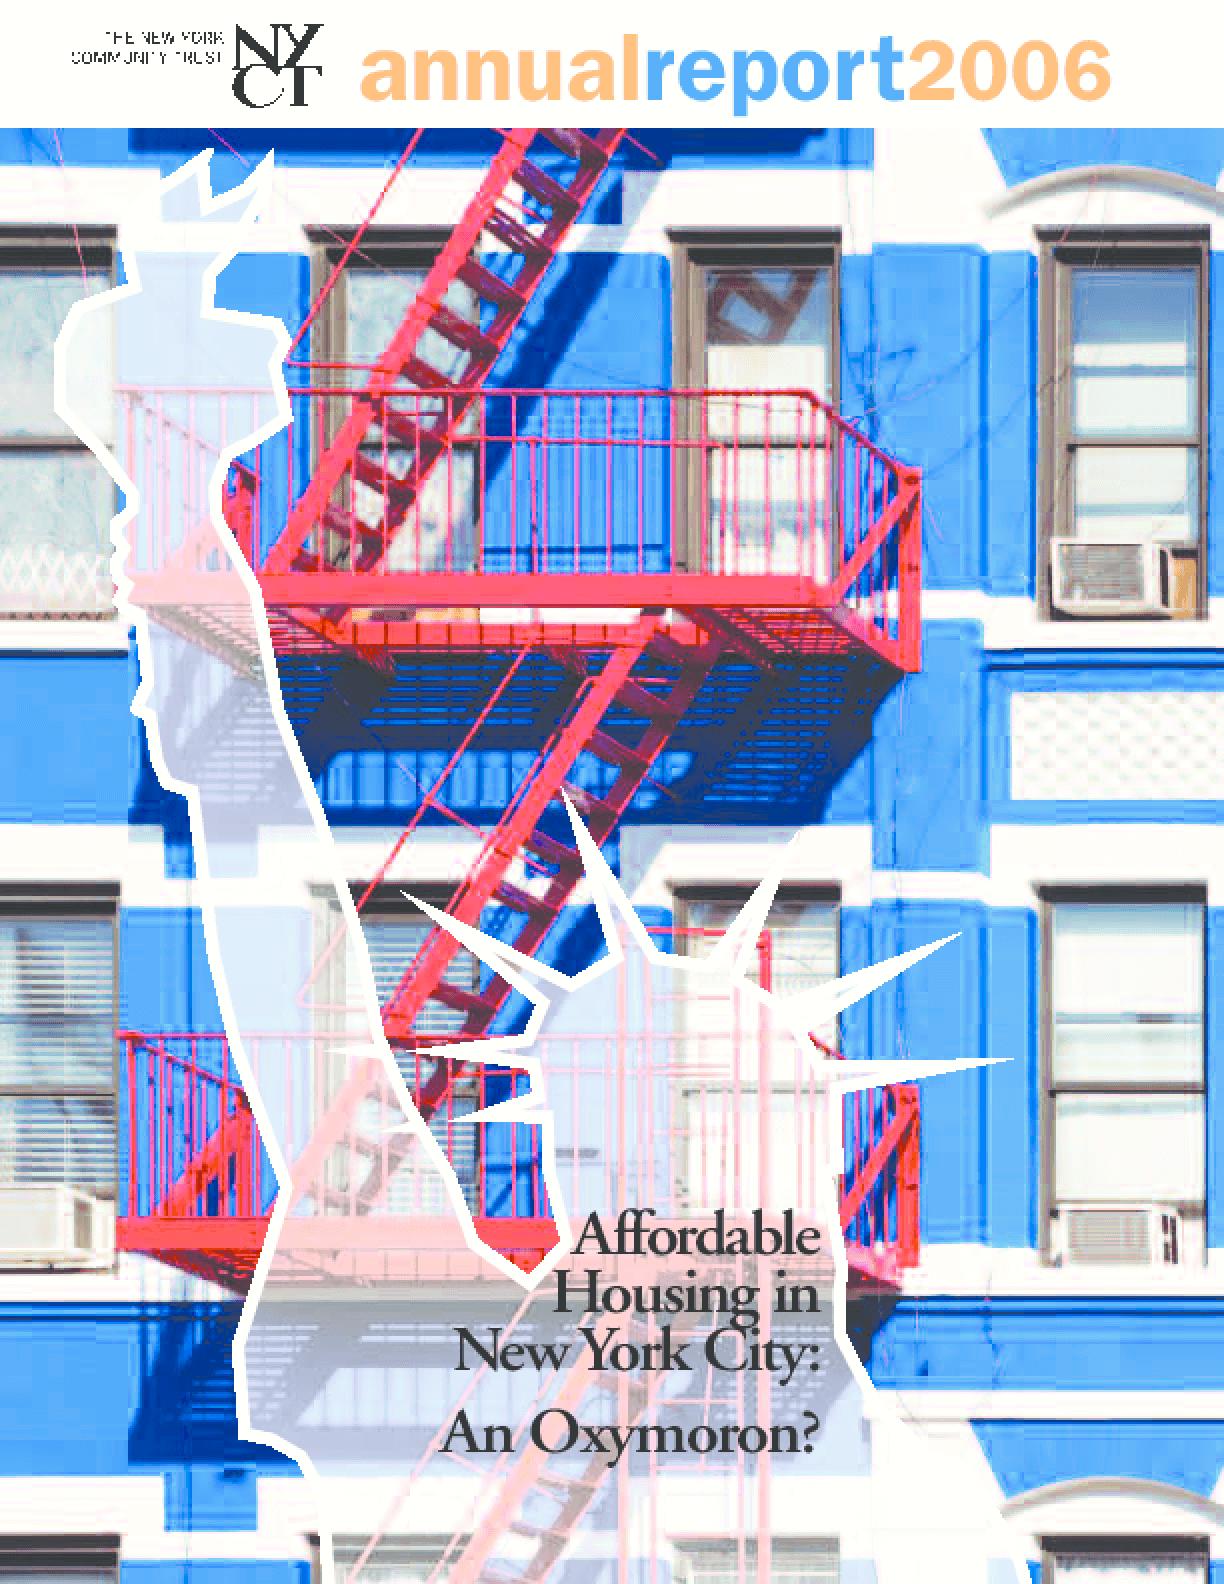 New York Community Trust - 2006 Annual Report